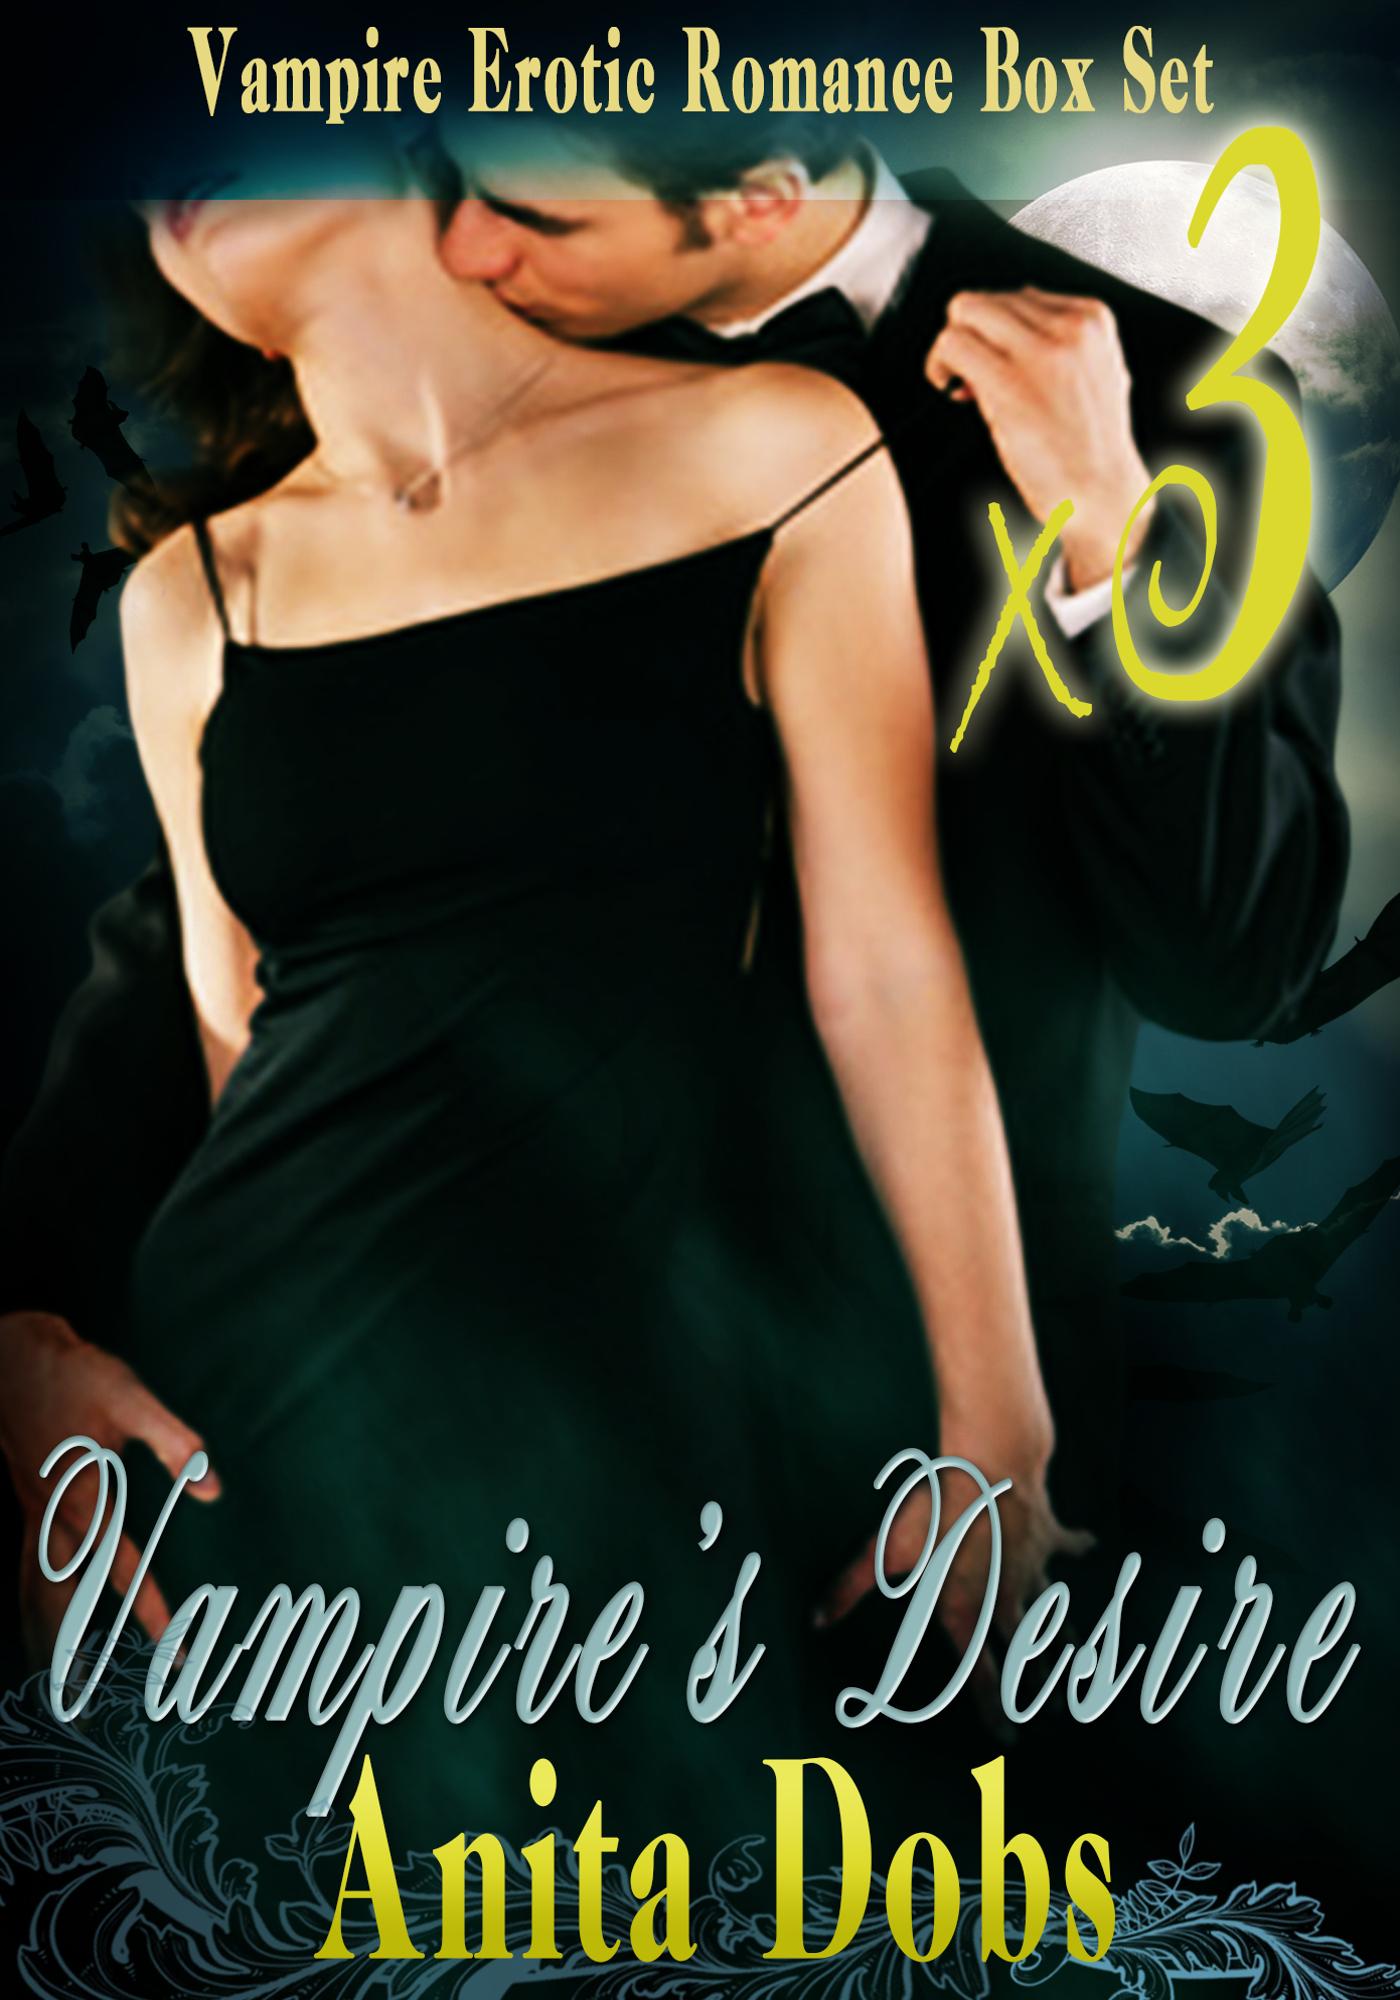 Vampire erotica stories exposed image